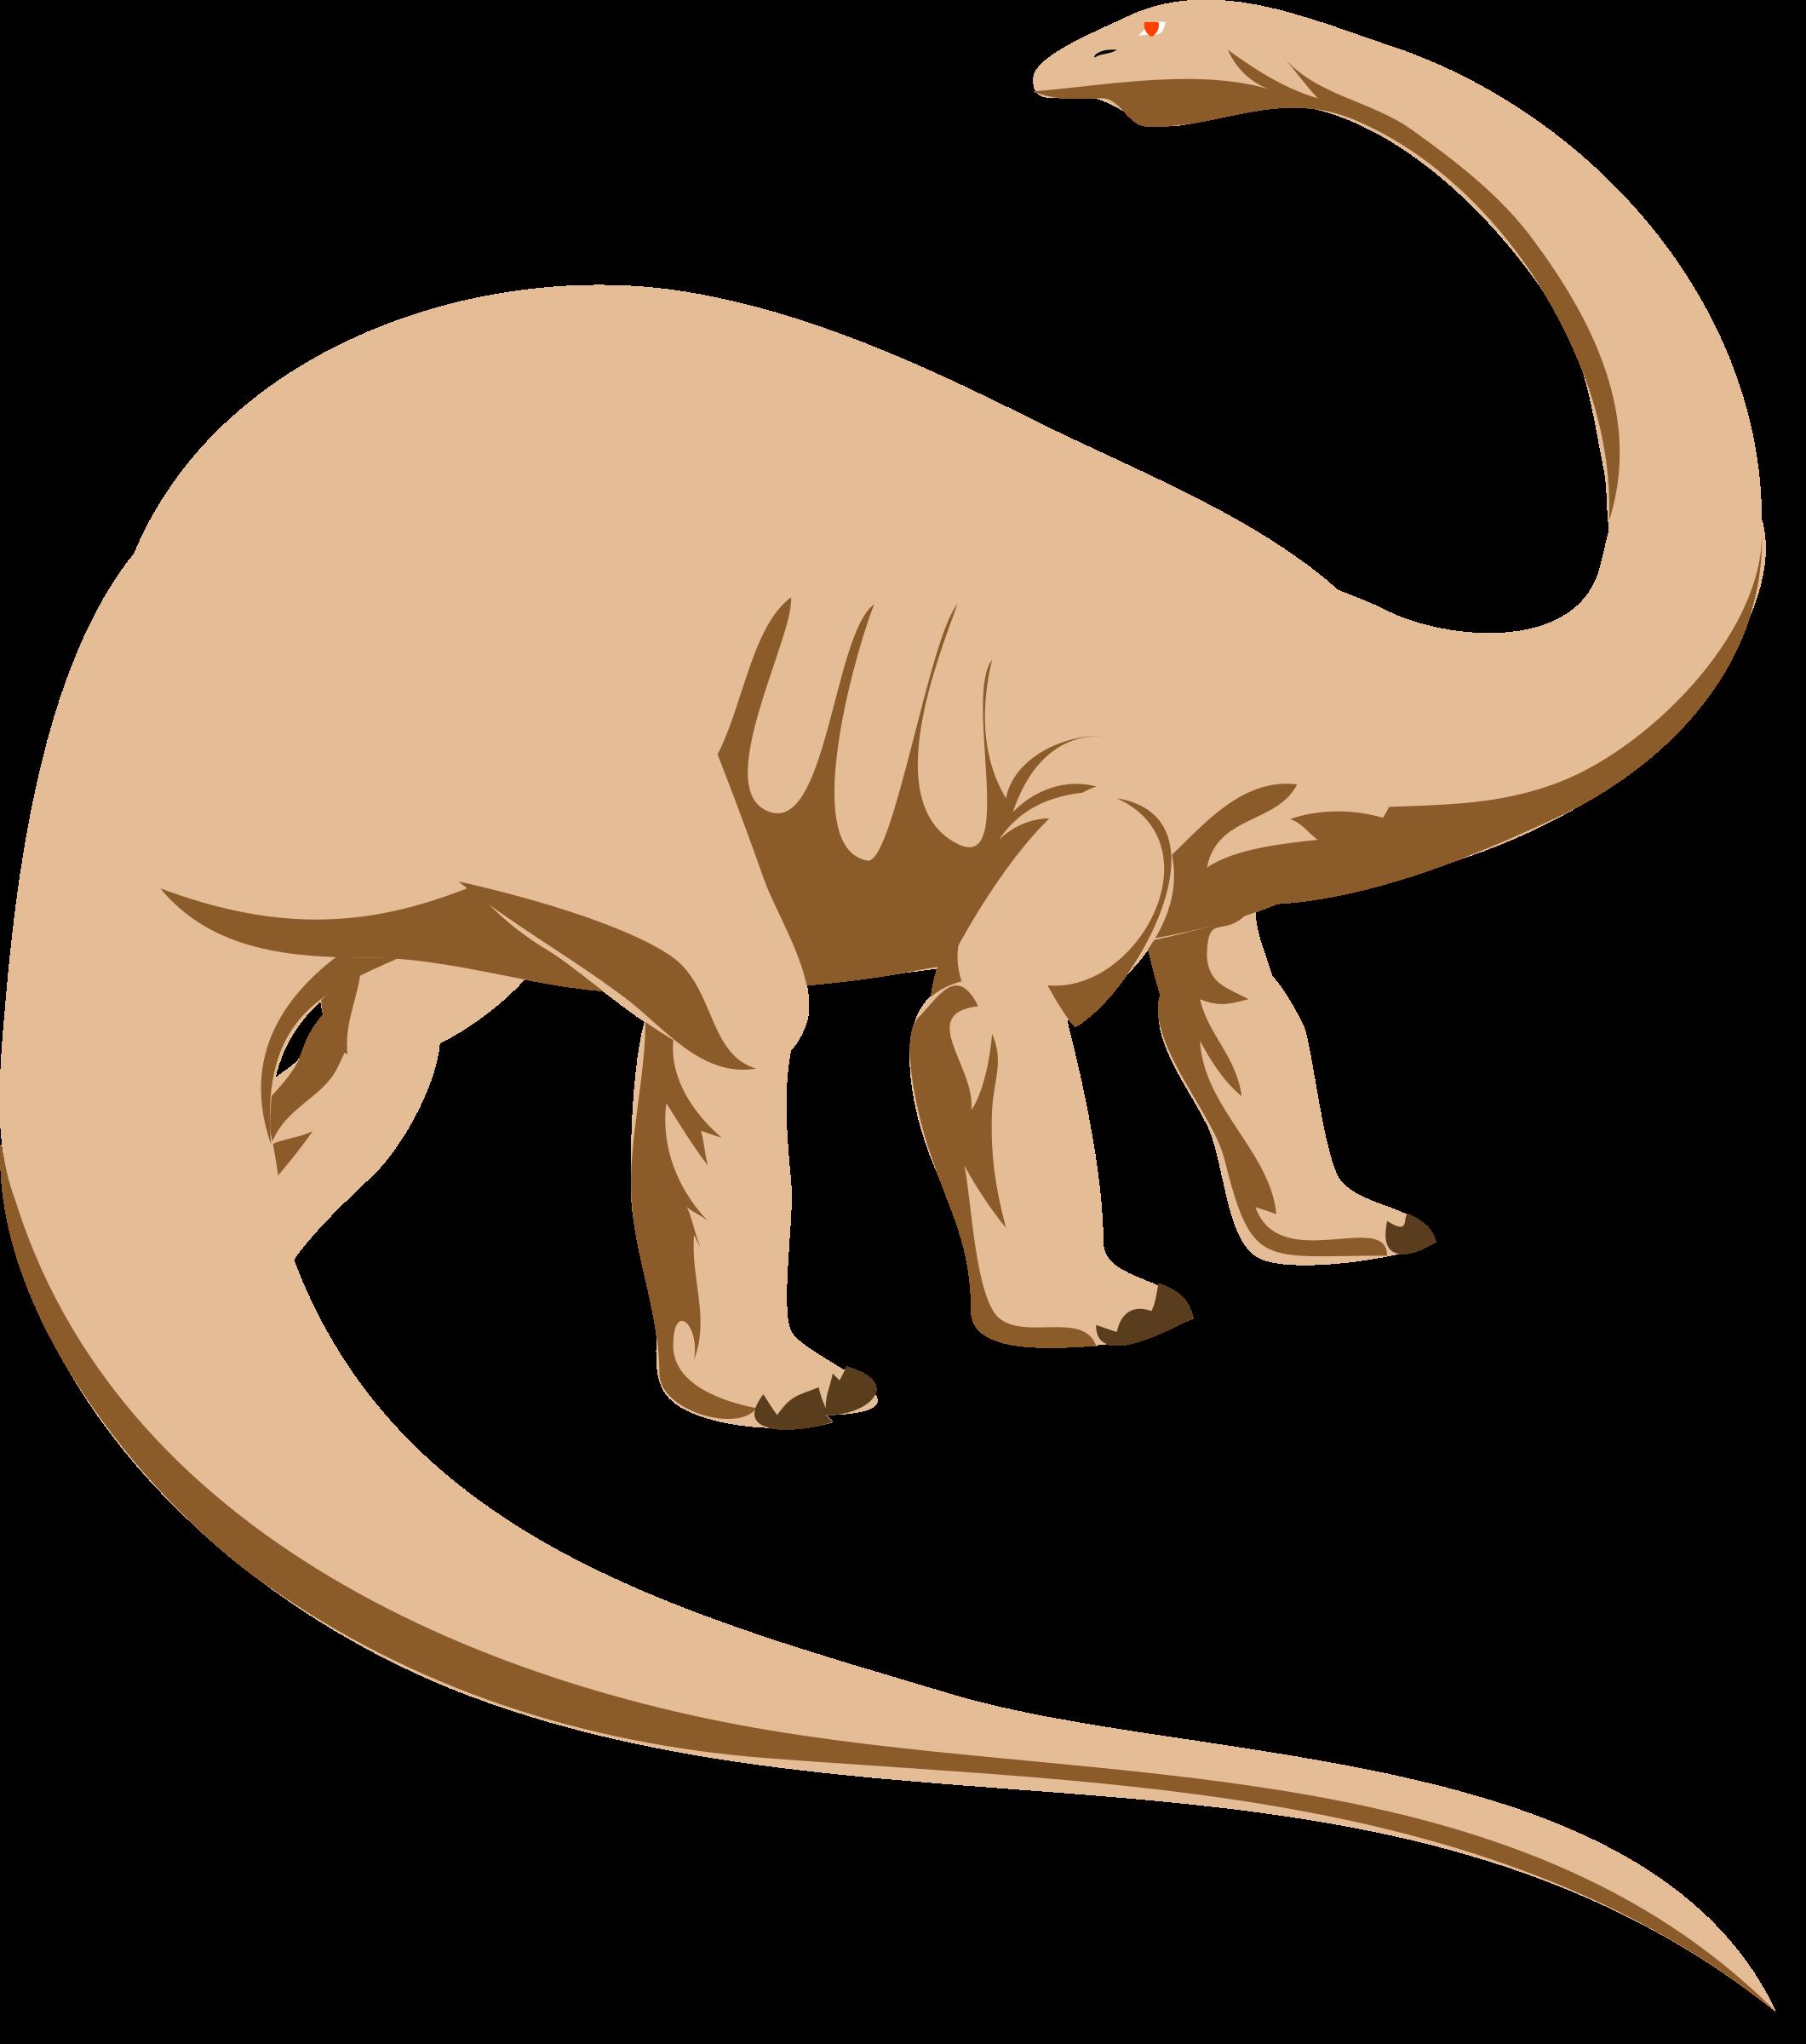 Dinosaur clipart brontosaurus. Architetto dino big image